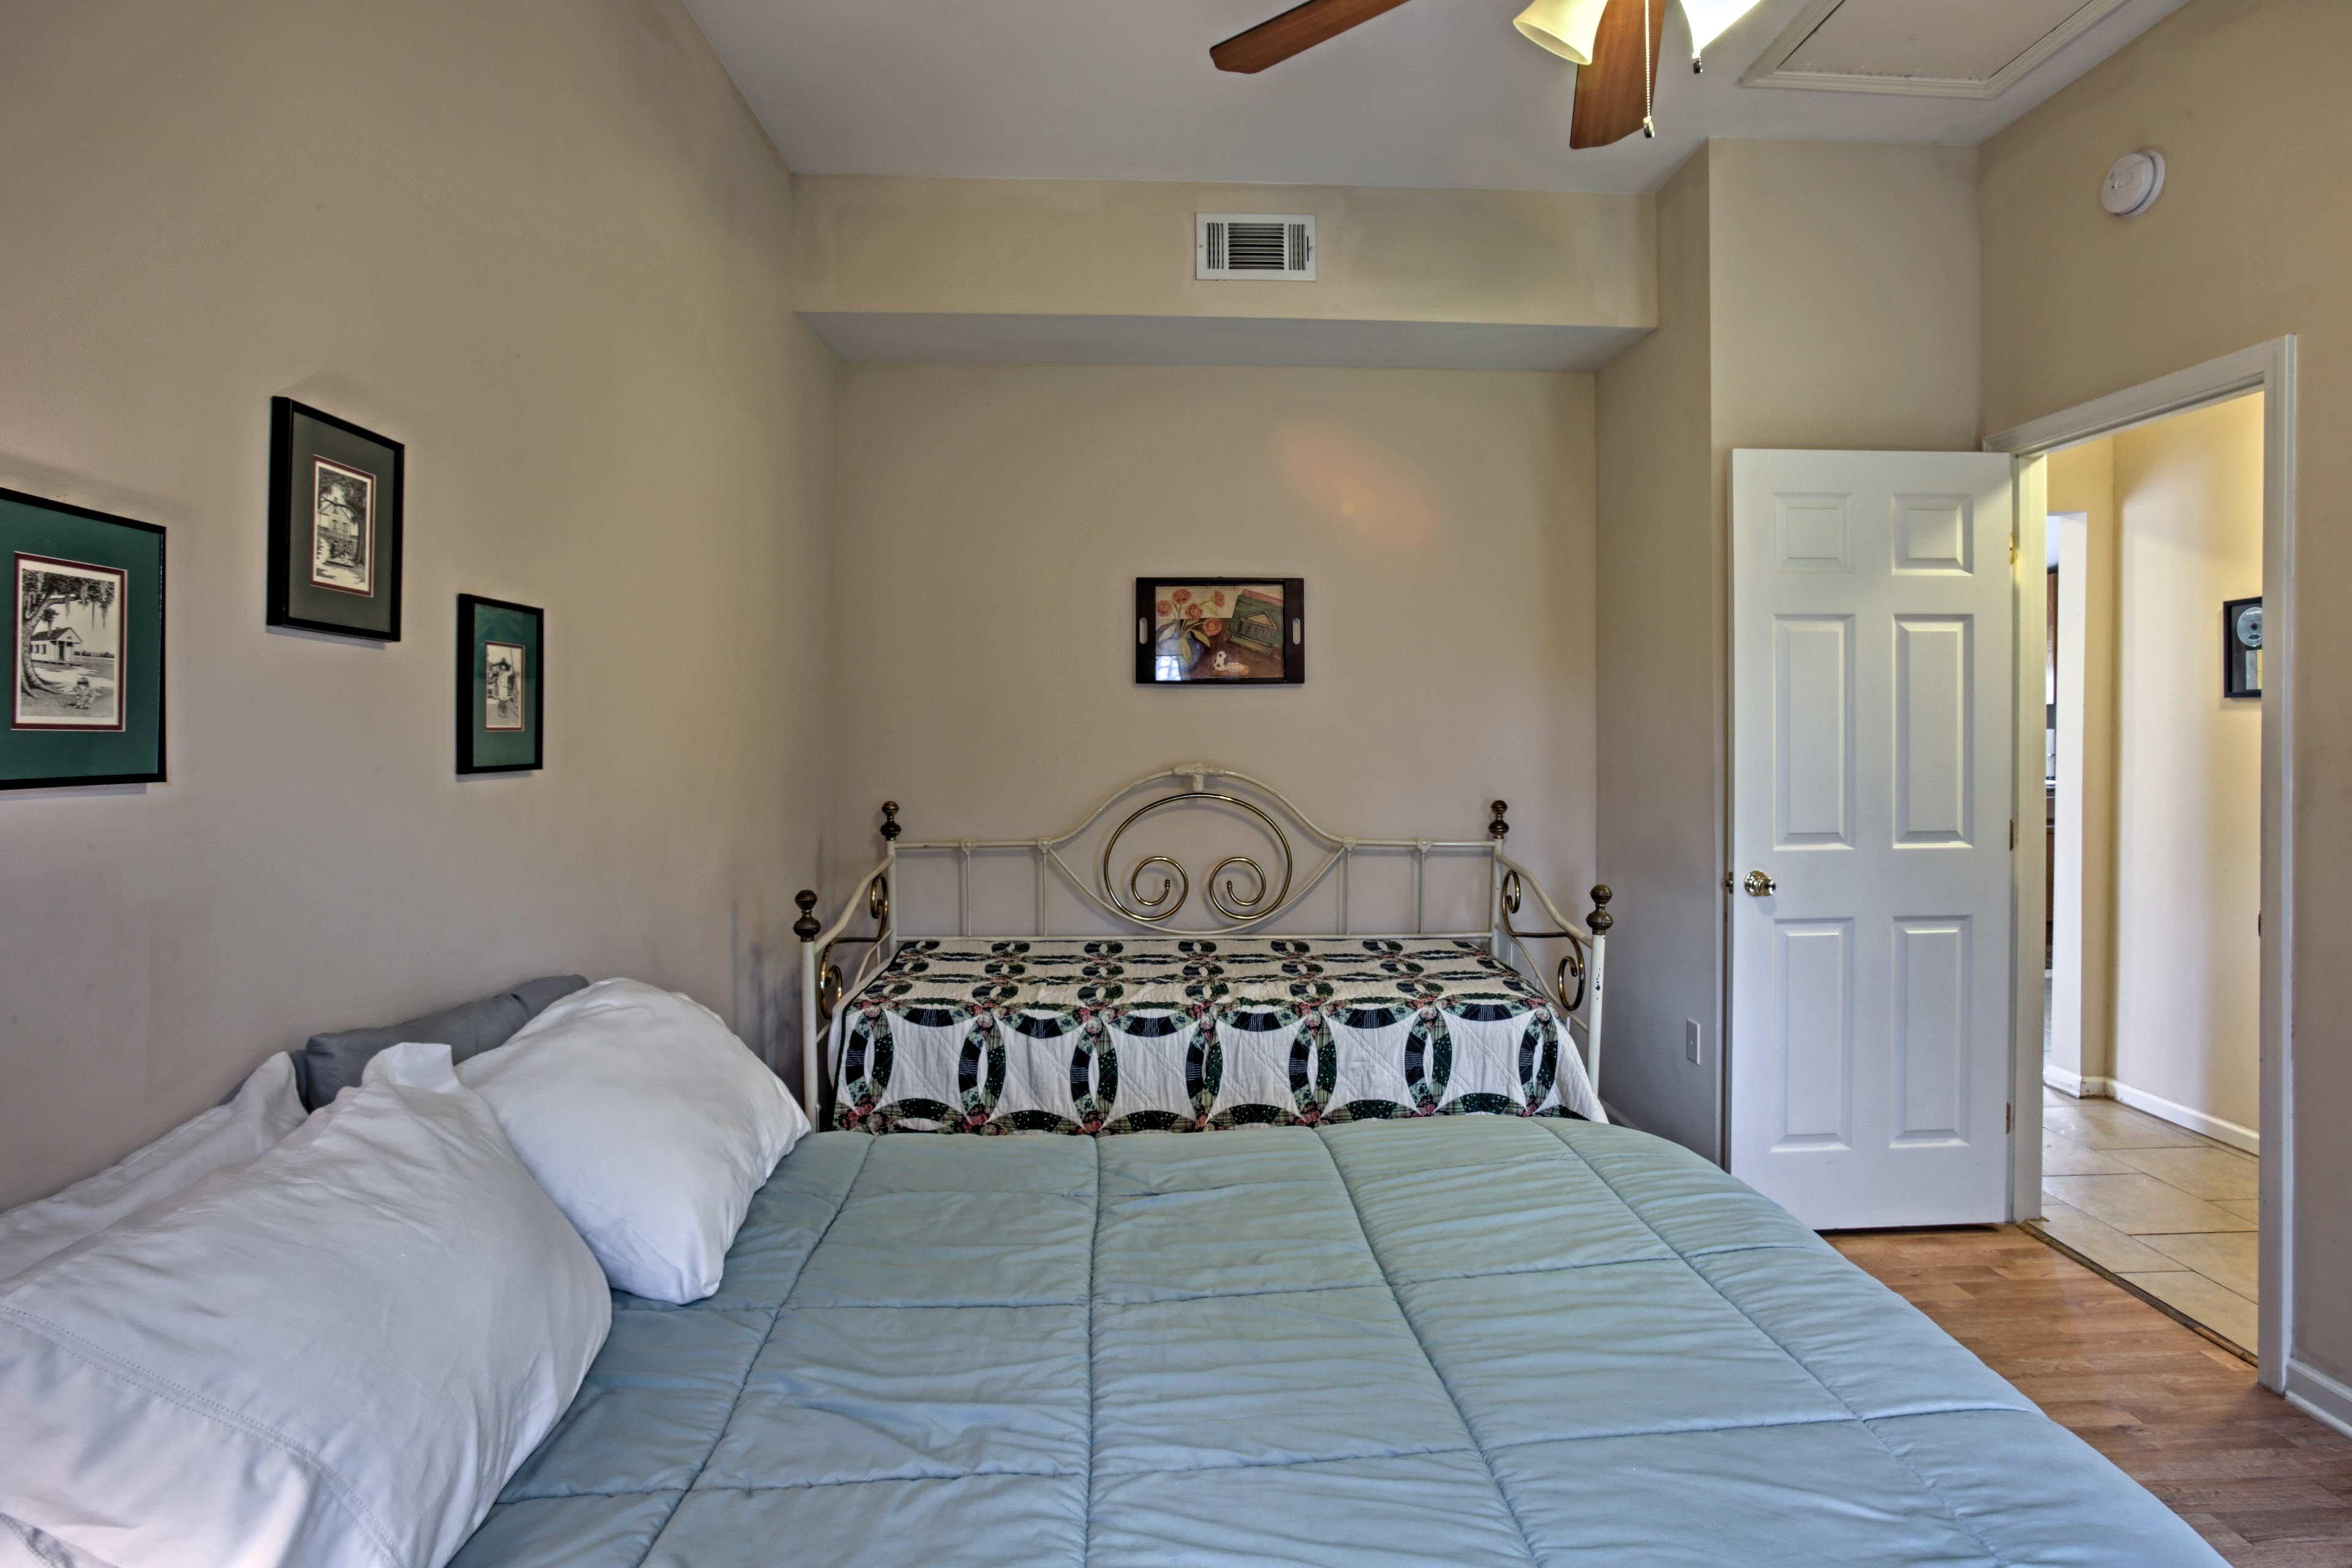 Pro 1 BR 2 beds 2